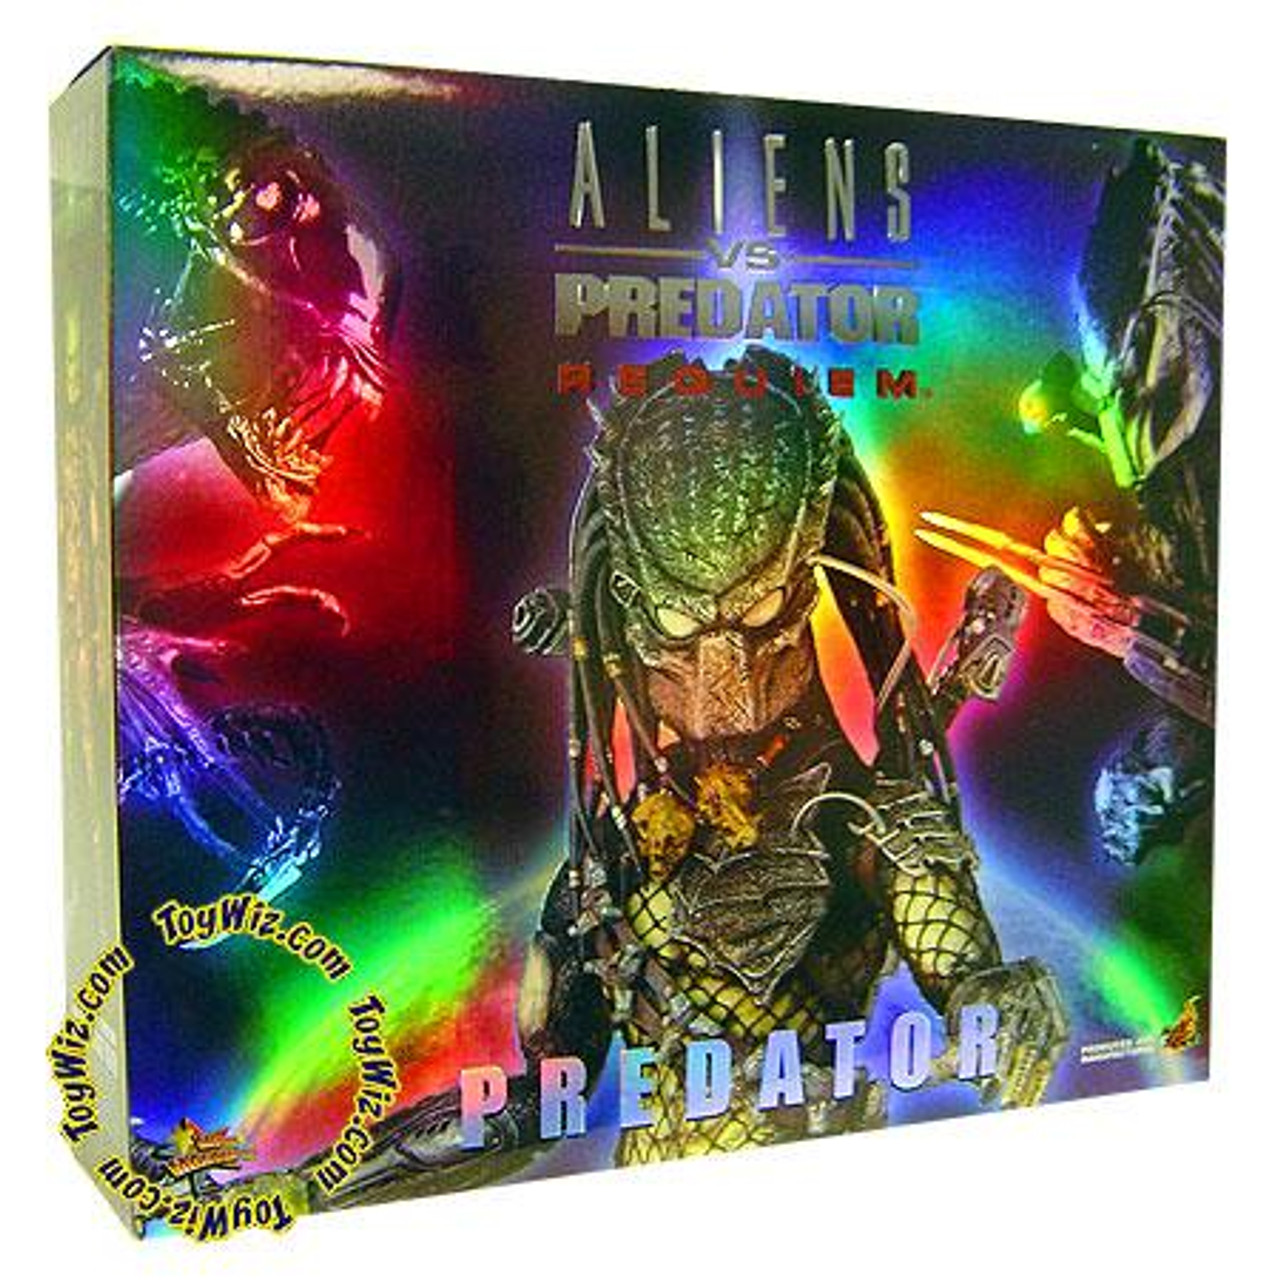 Aliens vs Predator Requiem Movie Masterpiece Predator 1/6 Collectible Figure [Wolf]